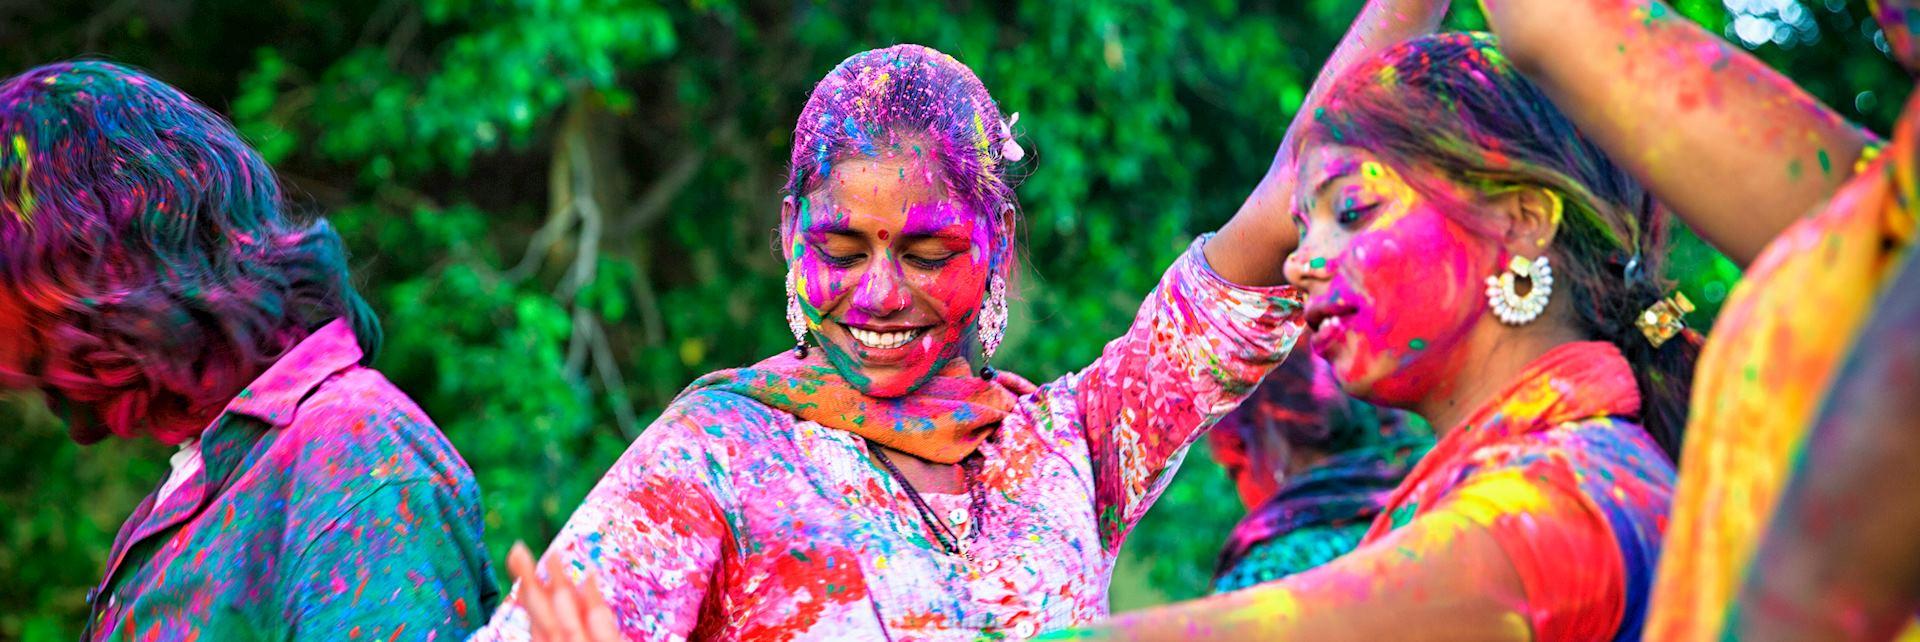 Celebrating Holi in Rajasthan